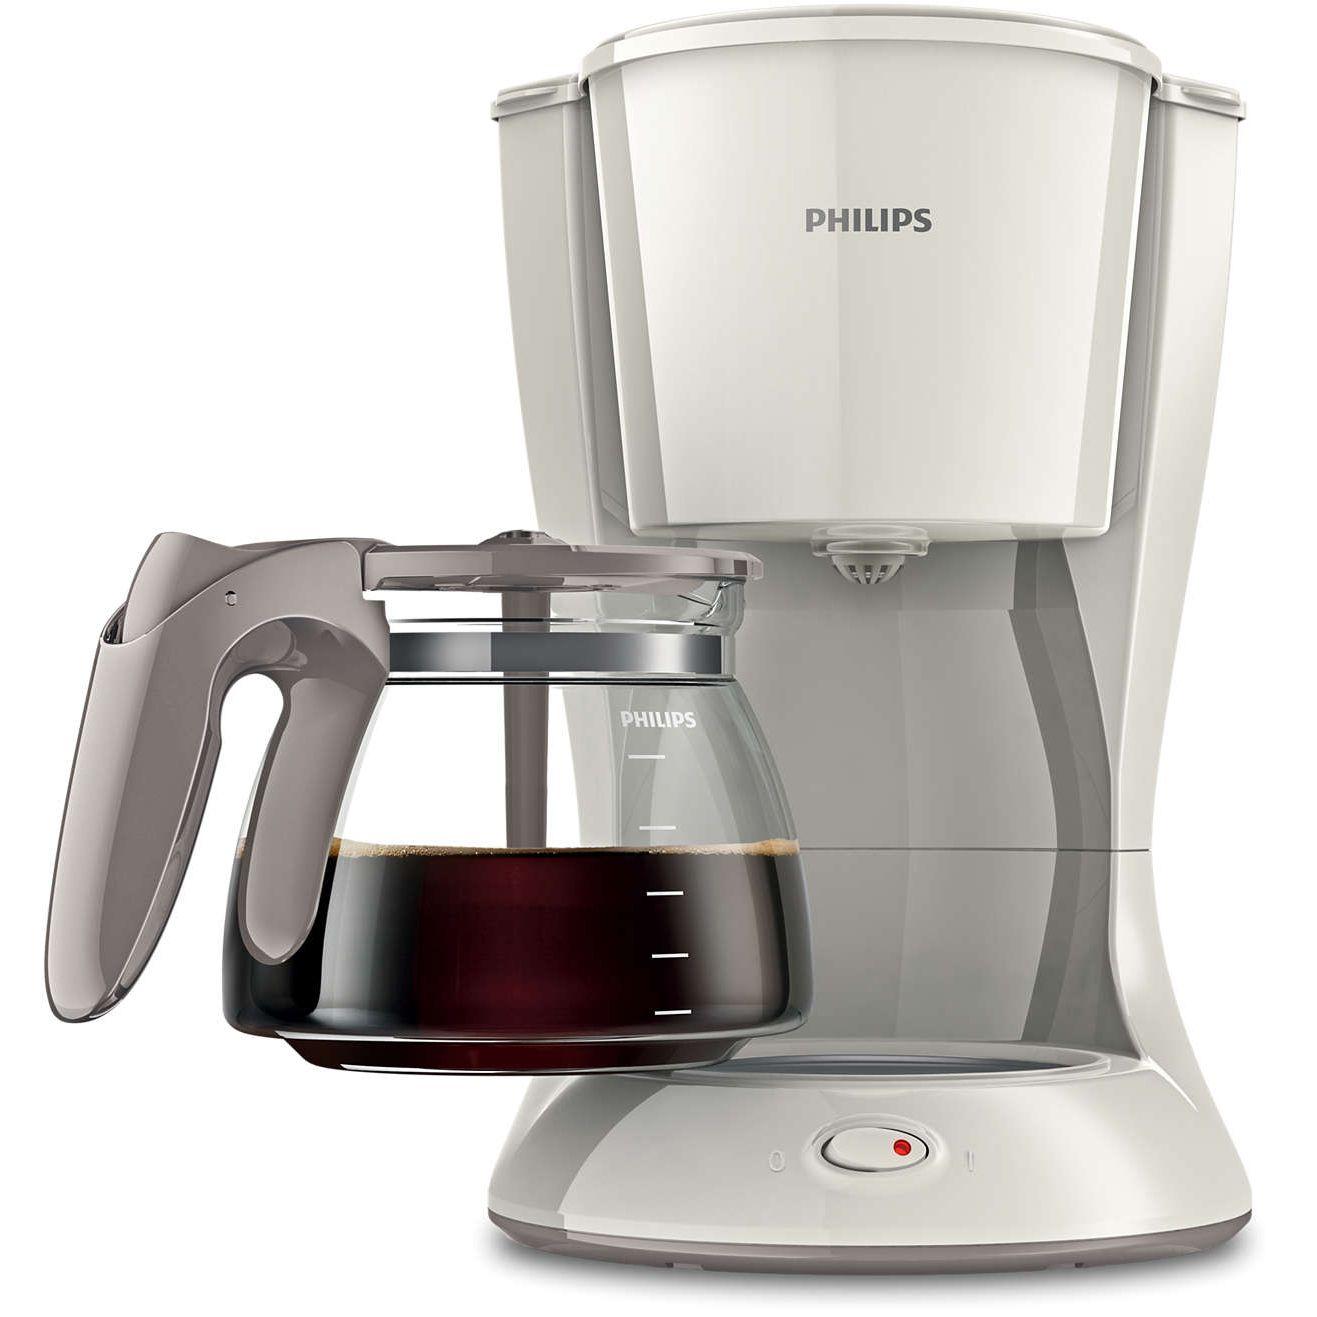 Philips HD7461 00 wygląd